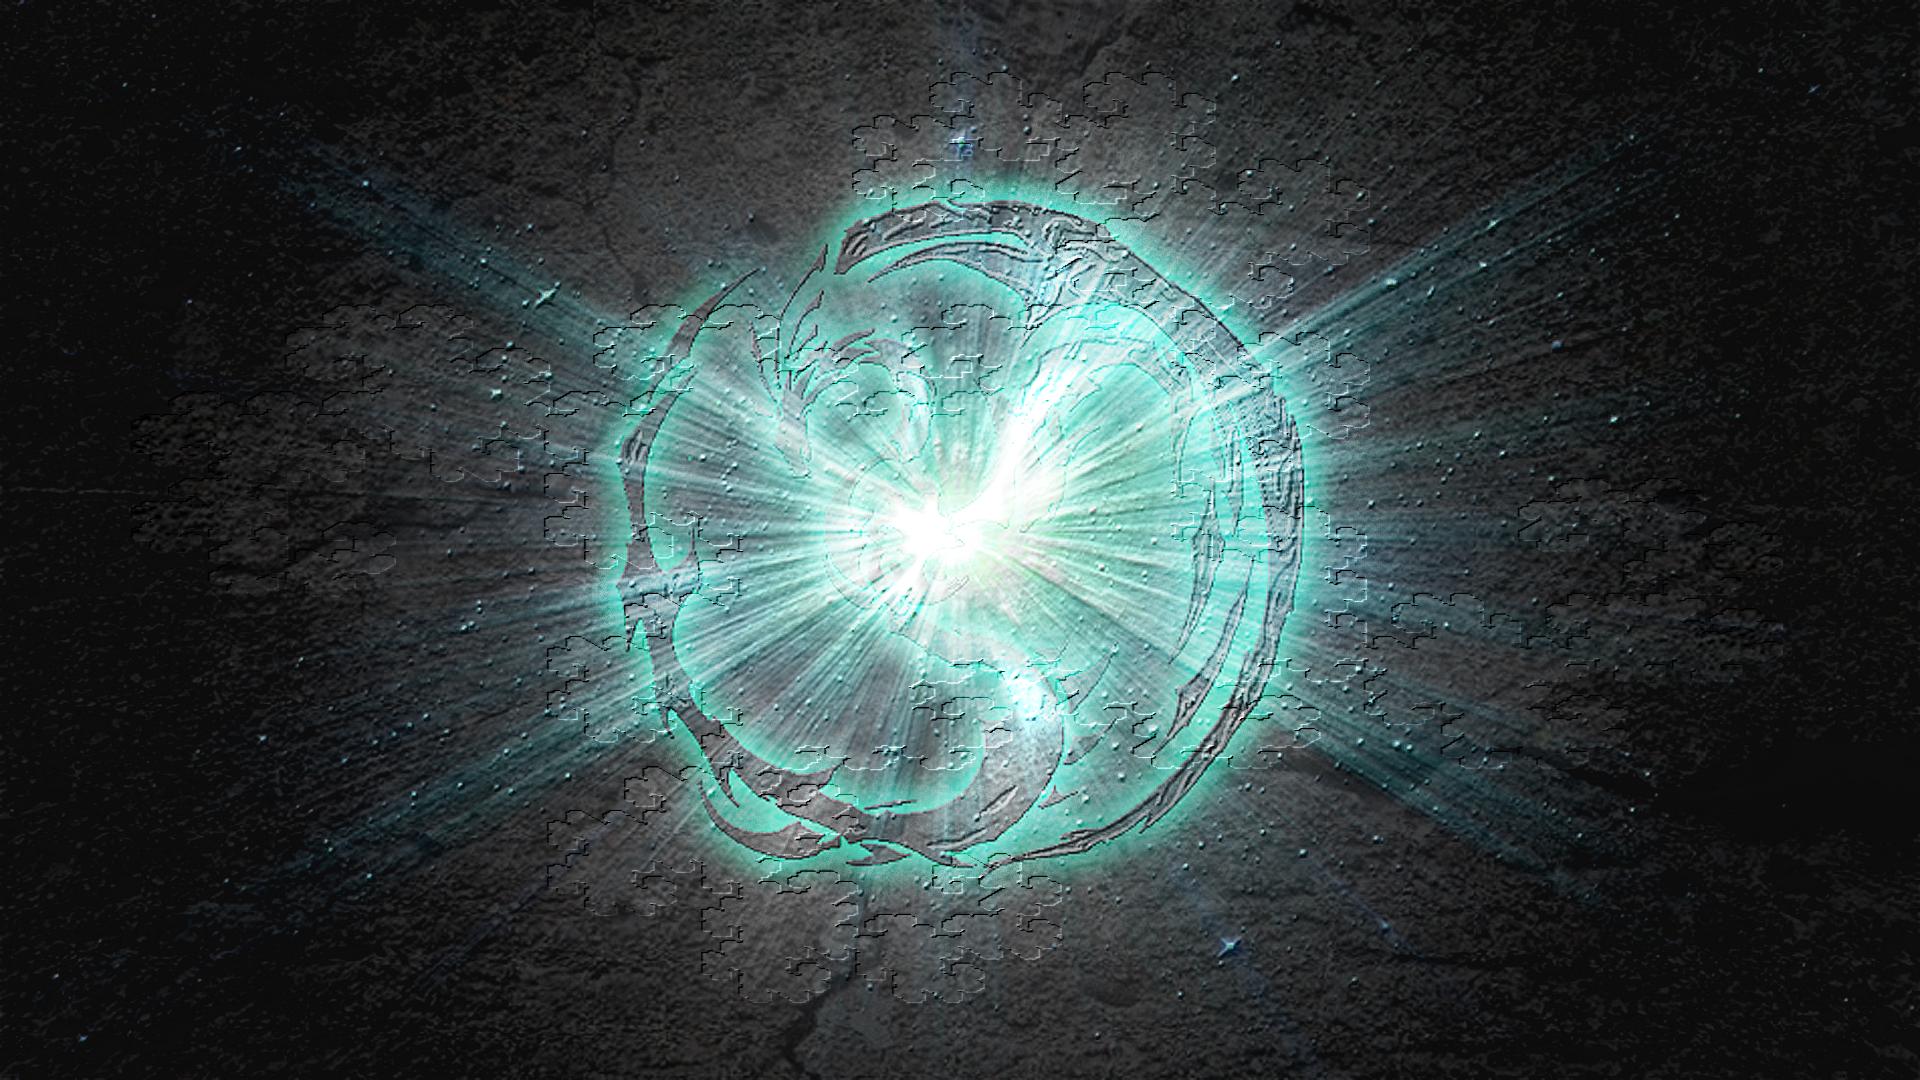 The Door Of Cracked Memory by DiggerEl7